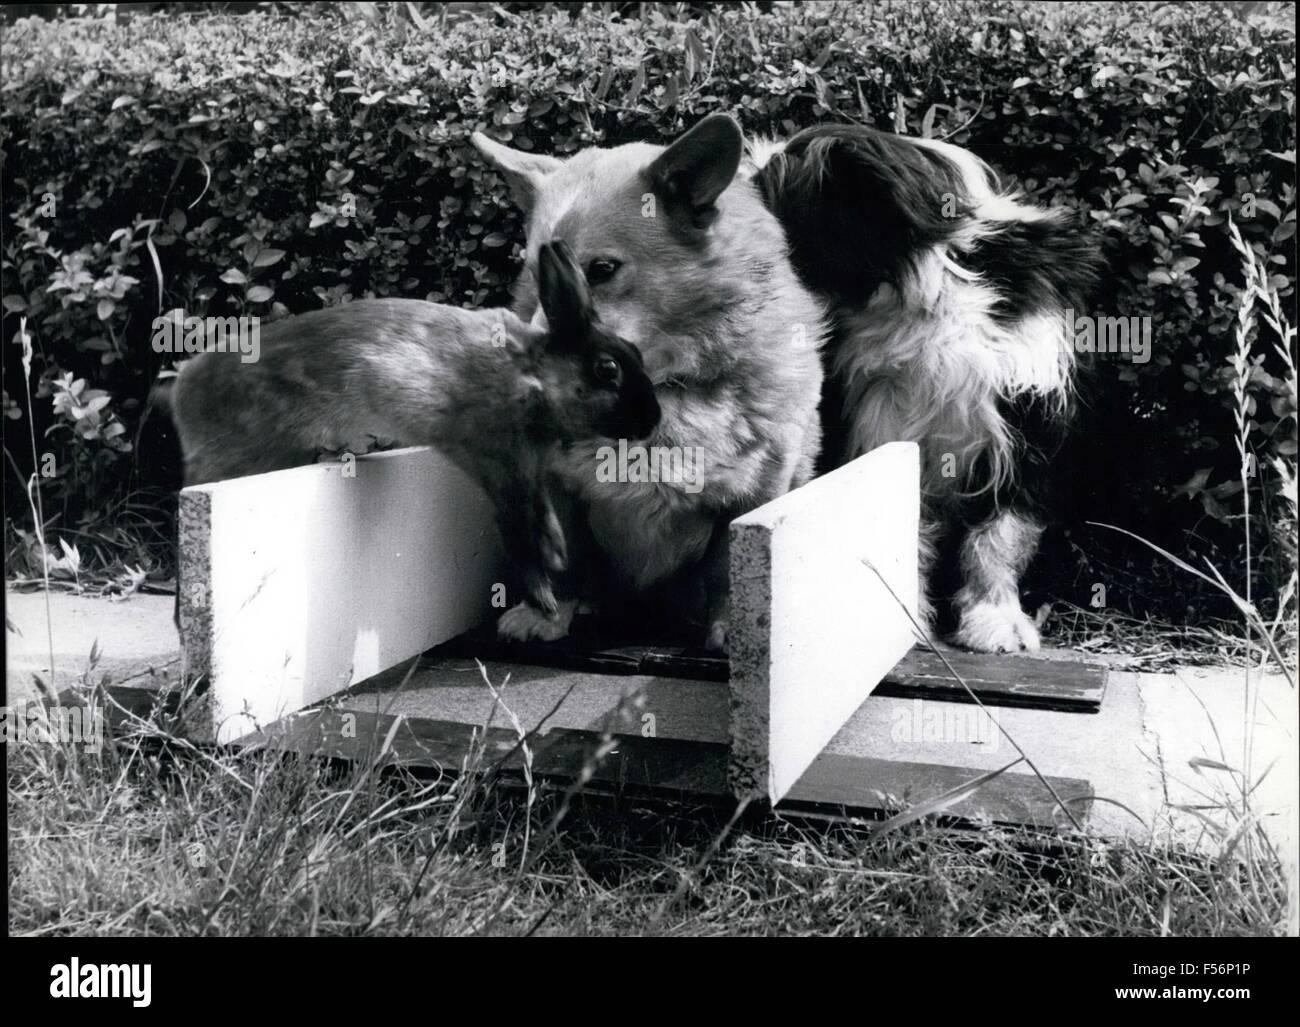 1962 - Corre conejo ! Maryanne etapas un 'Greyhound' race para divertir a Buster el Corgie y Jess. © Fotos Keystone USA/ZUMAPRESS.com/Alamy Live News Foto de stock